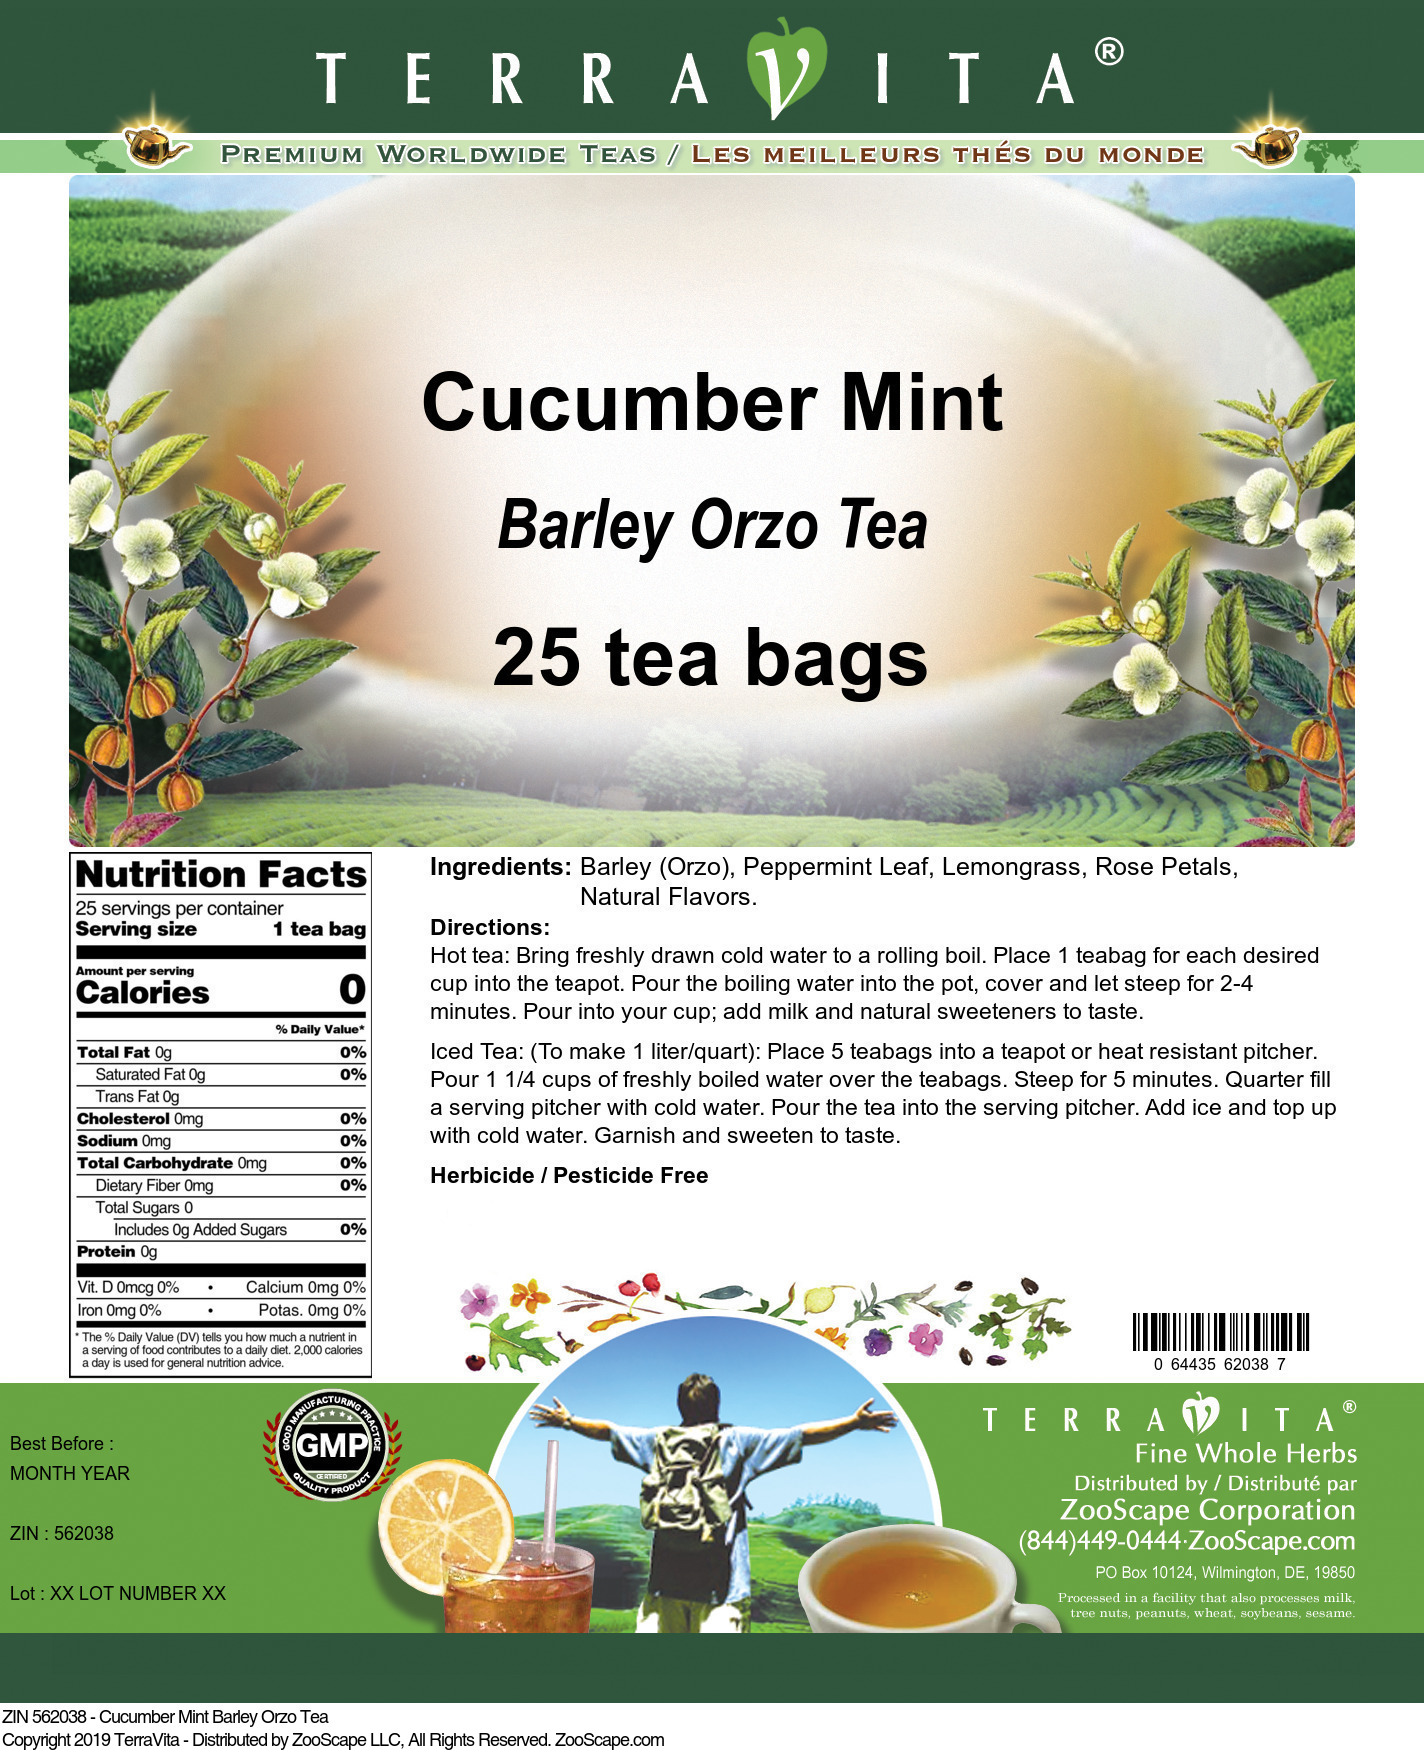 Cucumber Mint Barley Orzo Tea